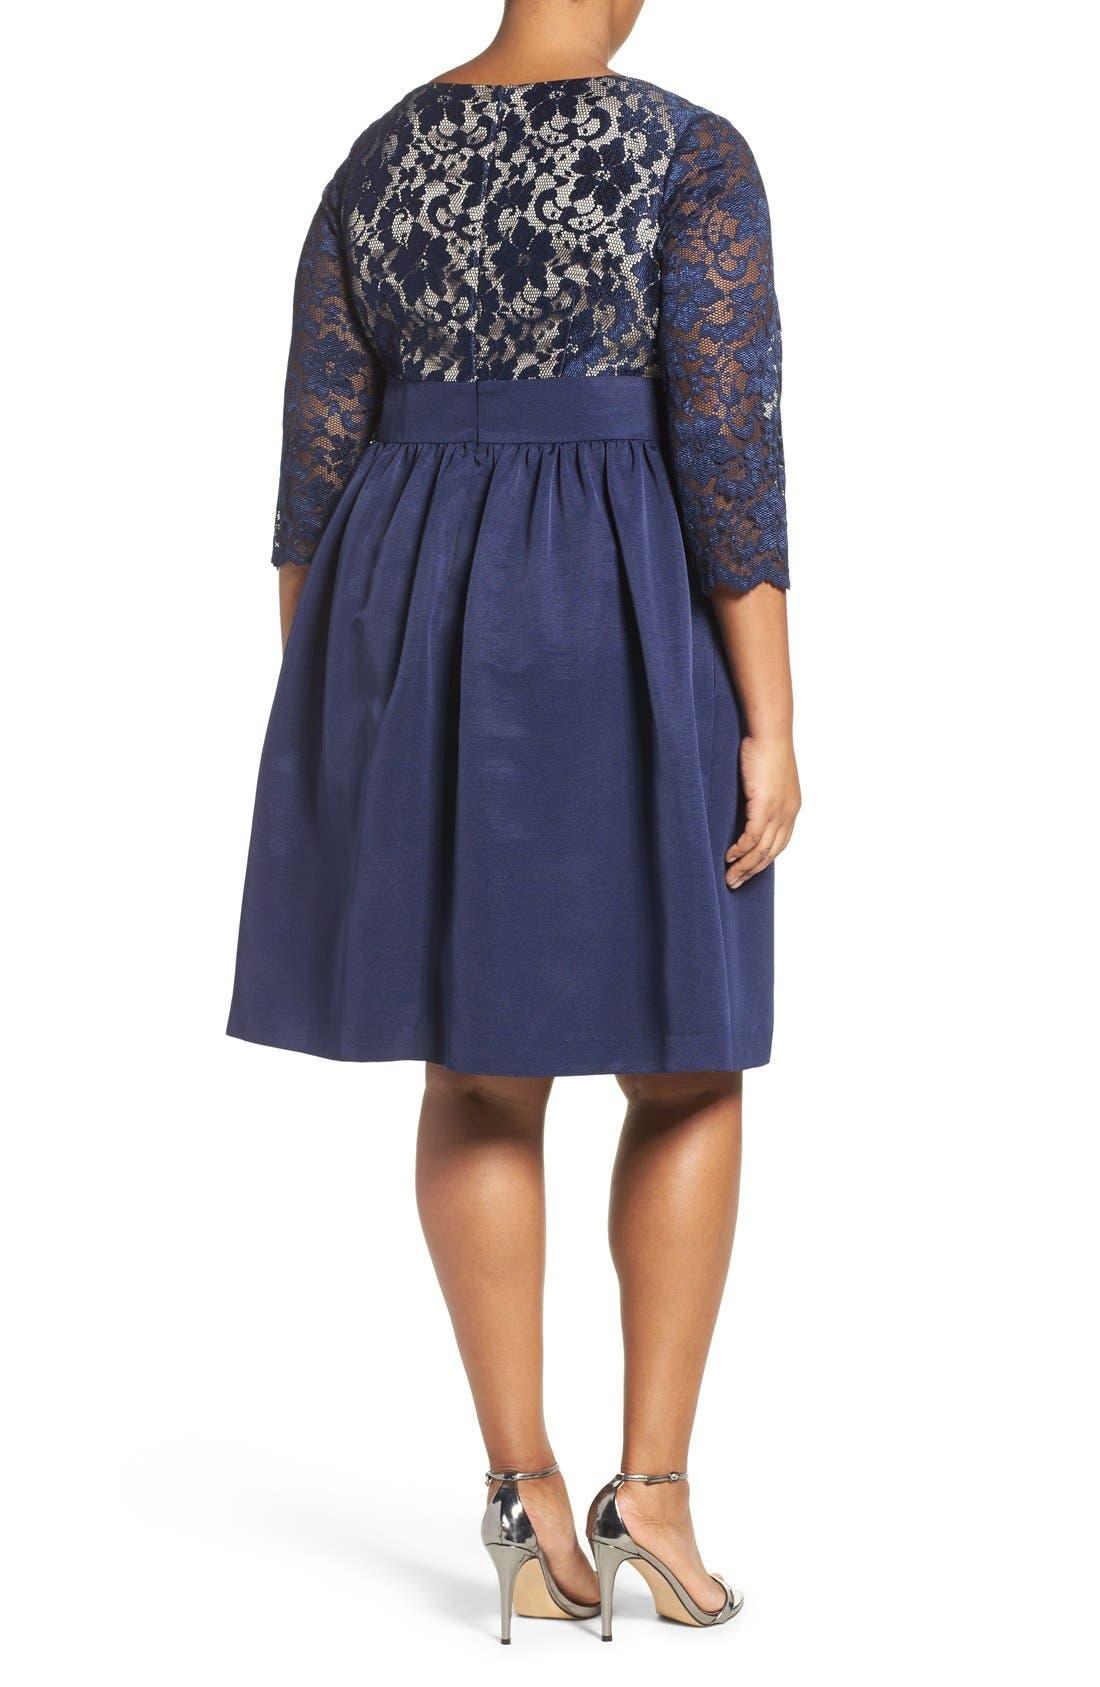 Alternate Image 3  - Eliza J Lace & Faille Dress (Plus Size)